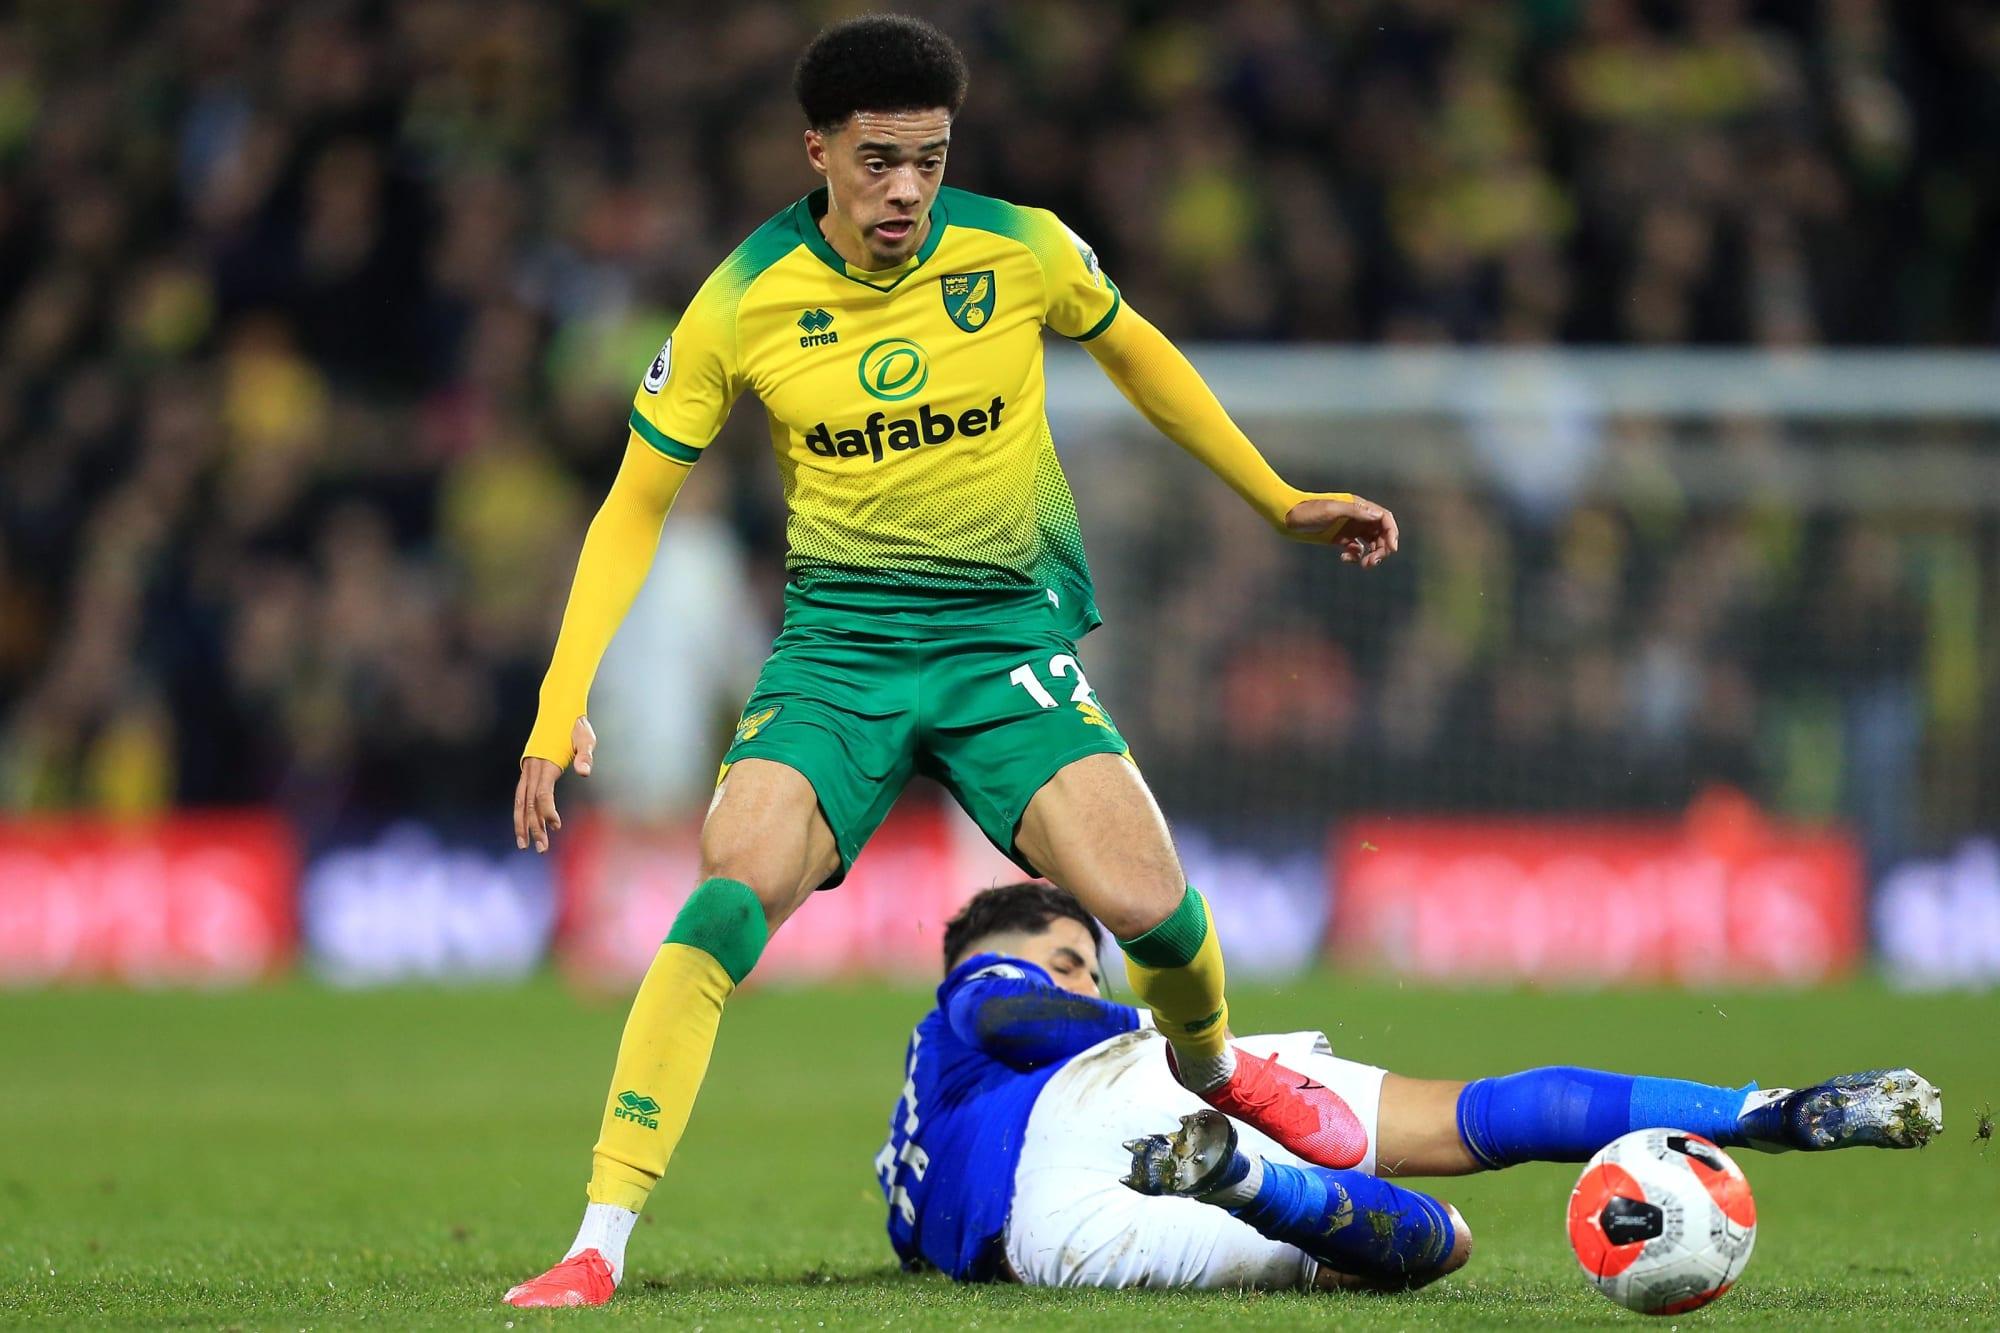 Should Leicester attempt to sign left-back Jamal Lewis?